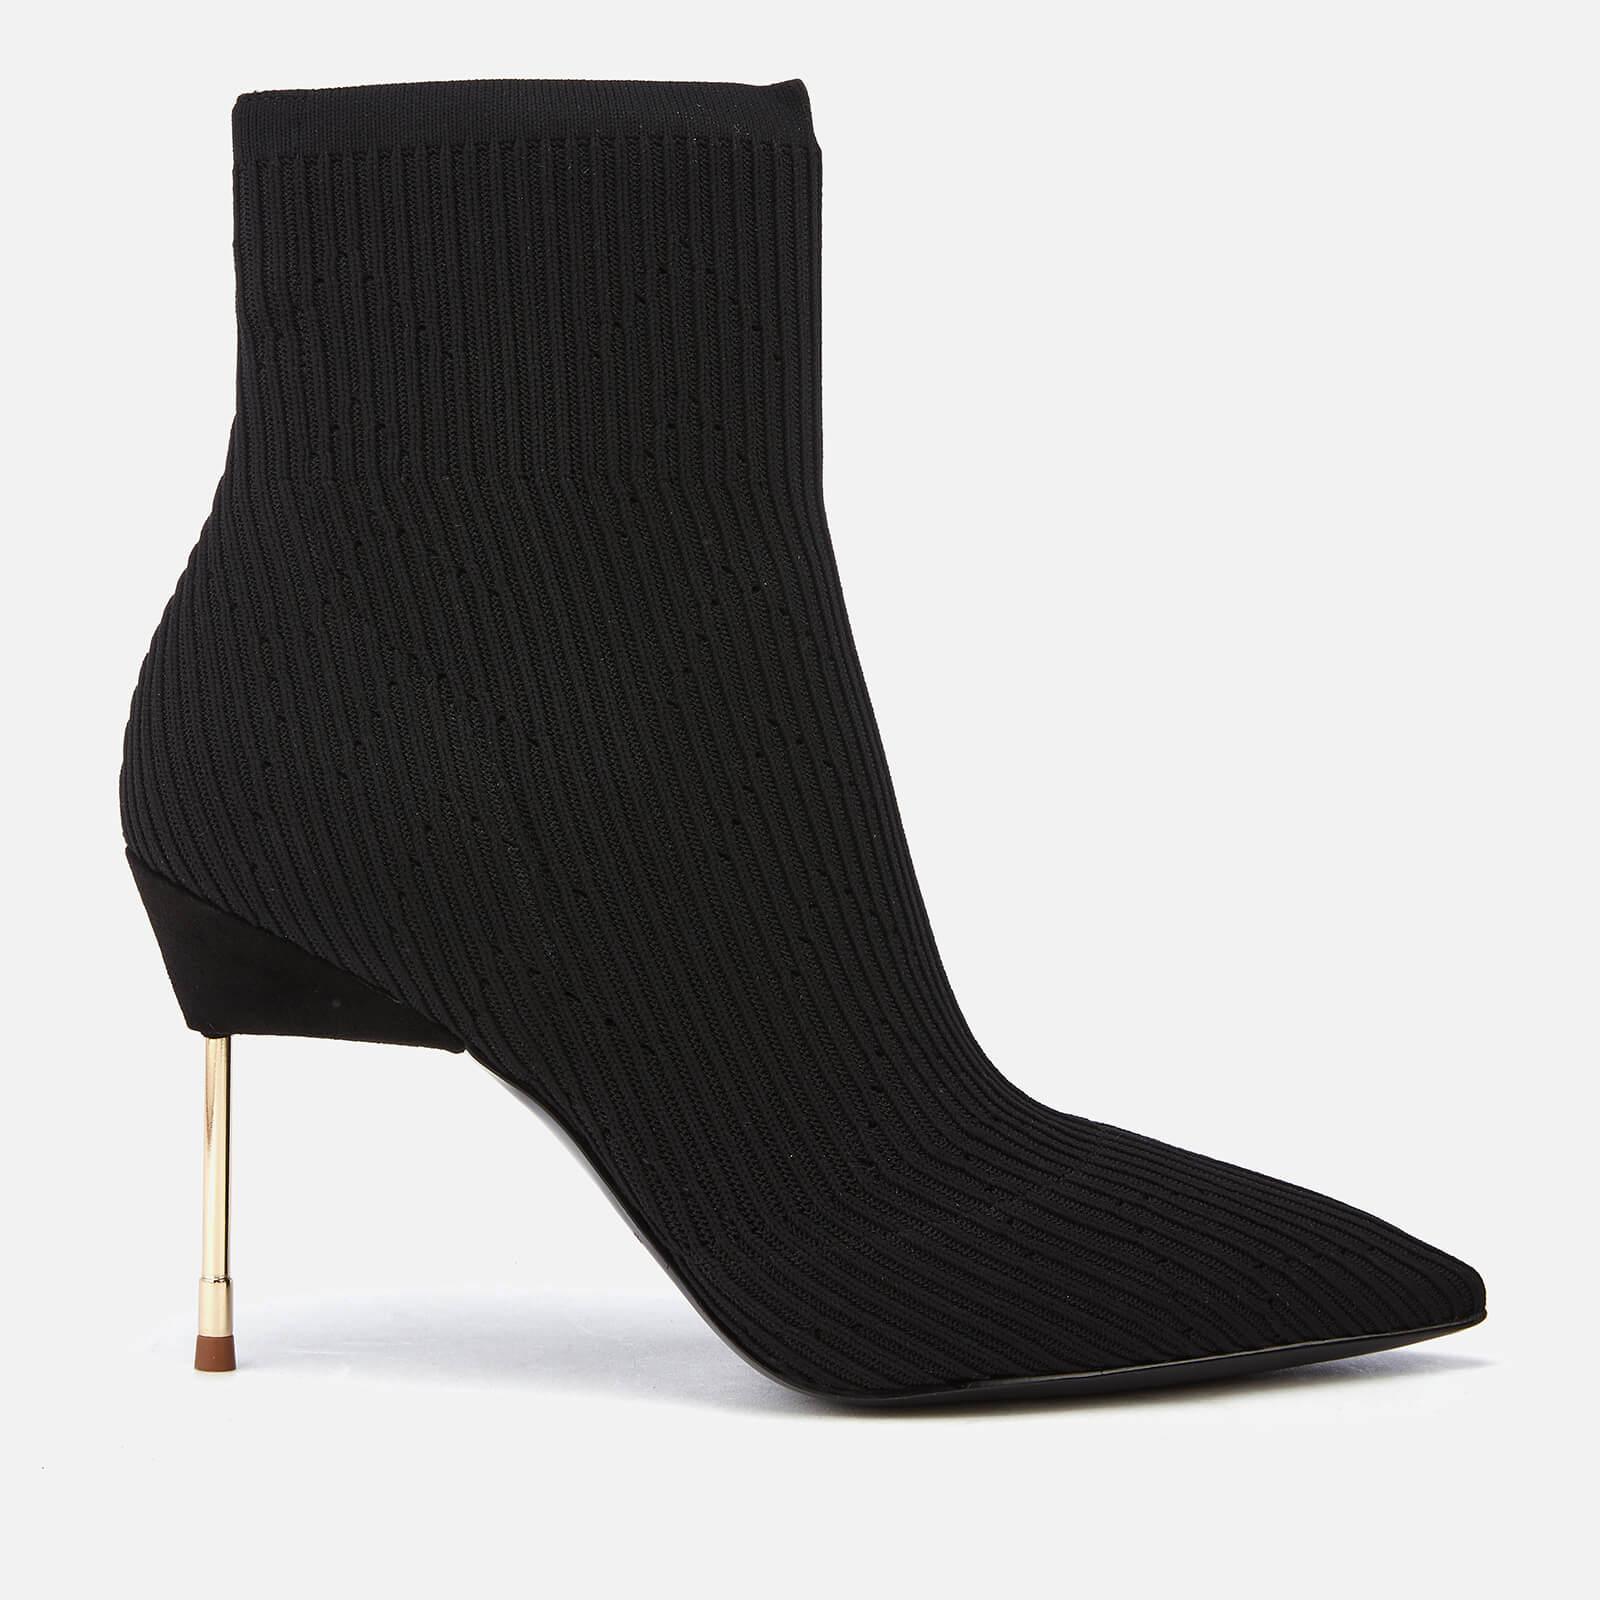 Kurt Geiger London Women's Barbican Stretch Heeled Ankle Boots - Black - UK 5